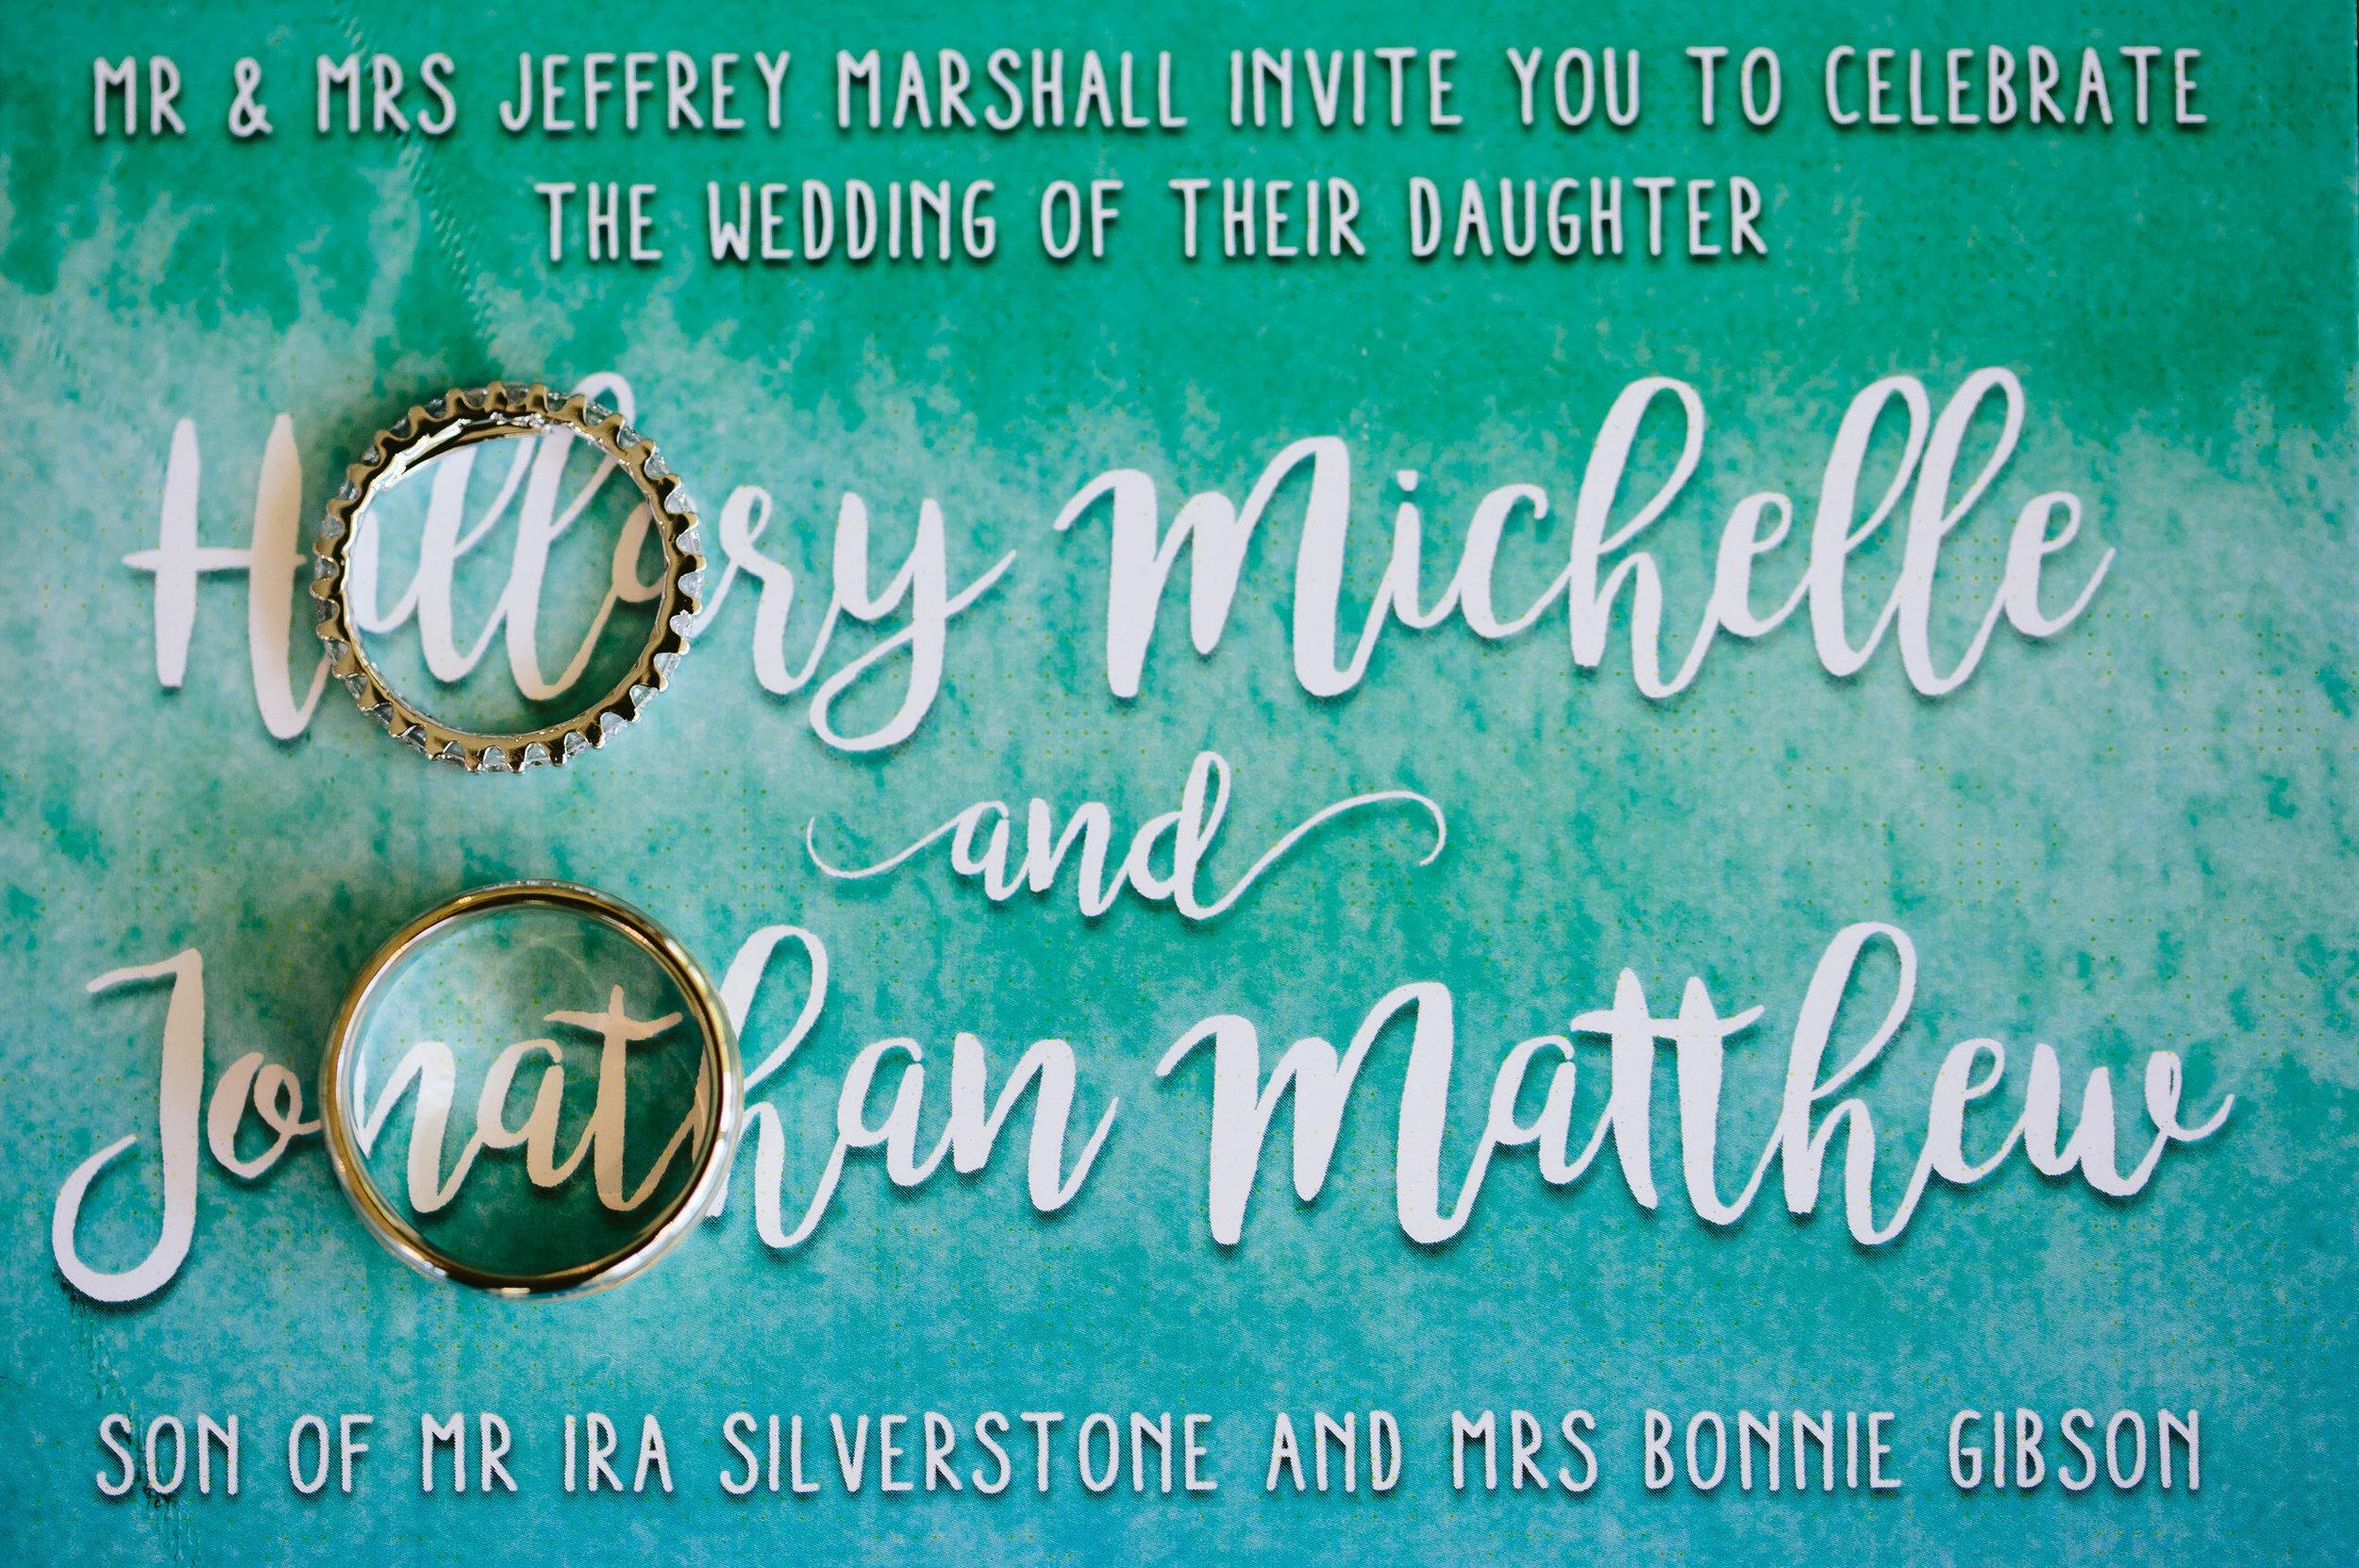 rings_invitation_wedding_details.jpg